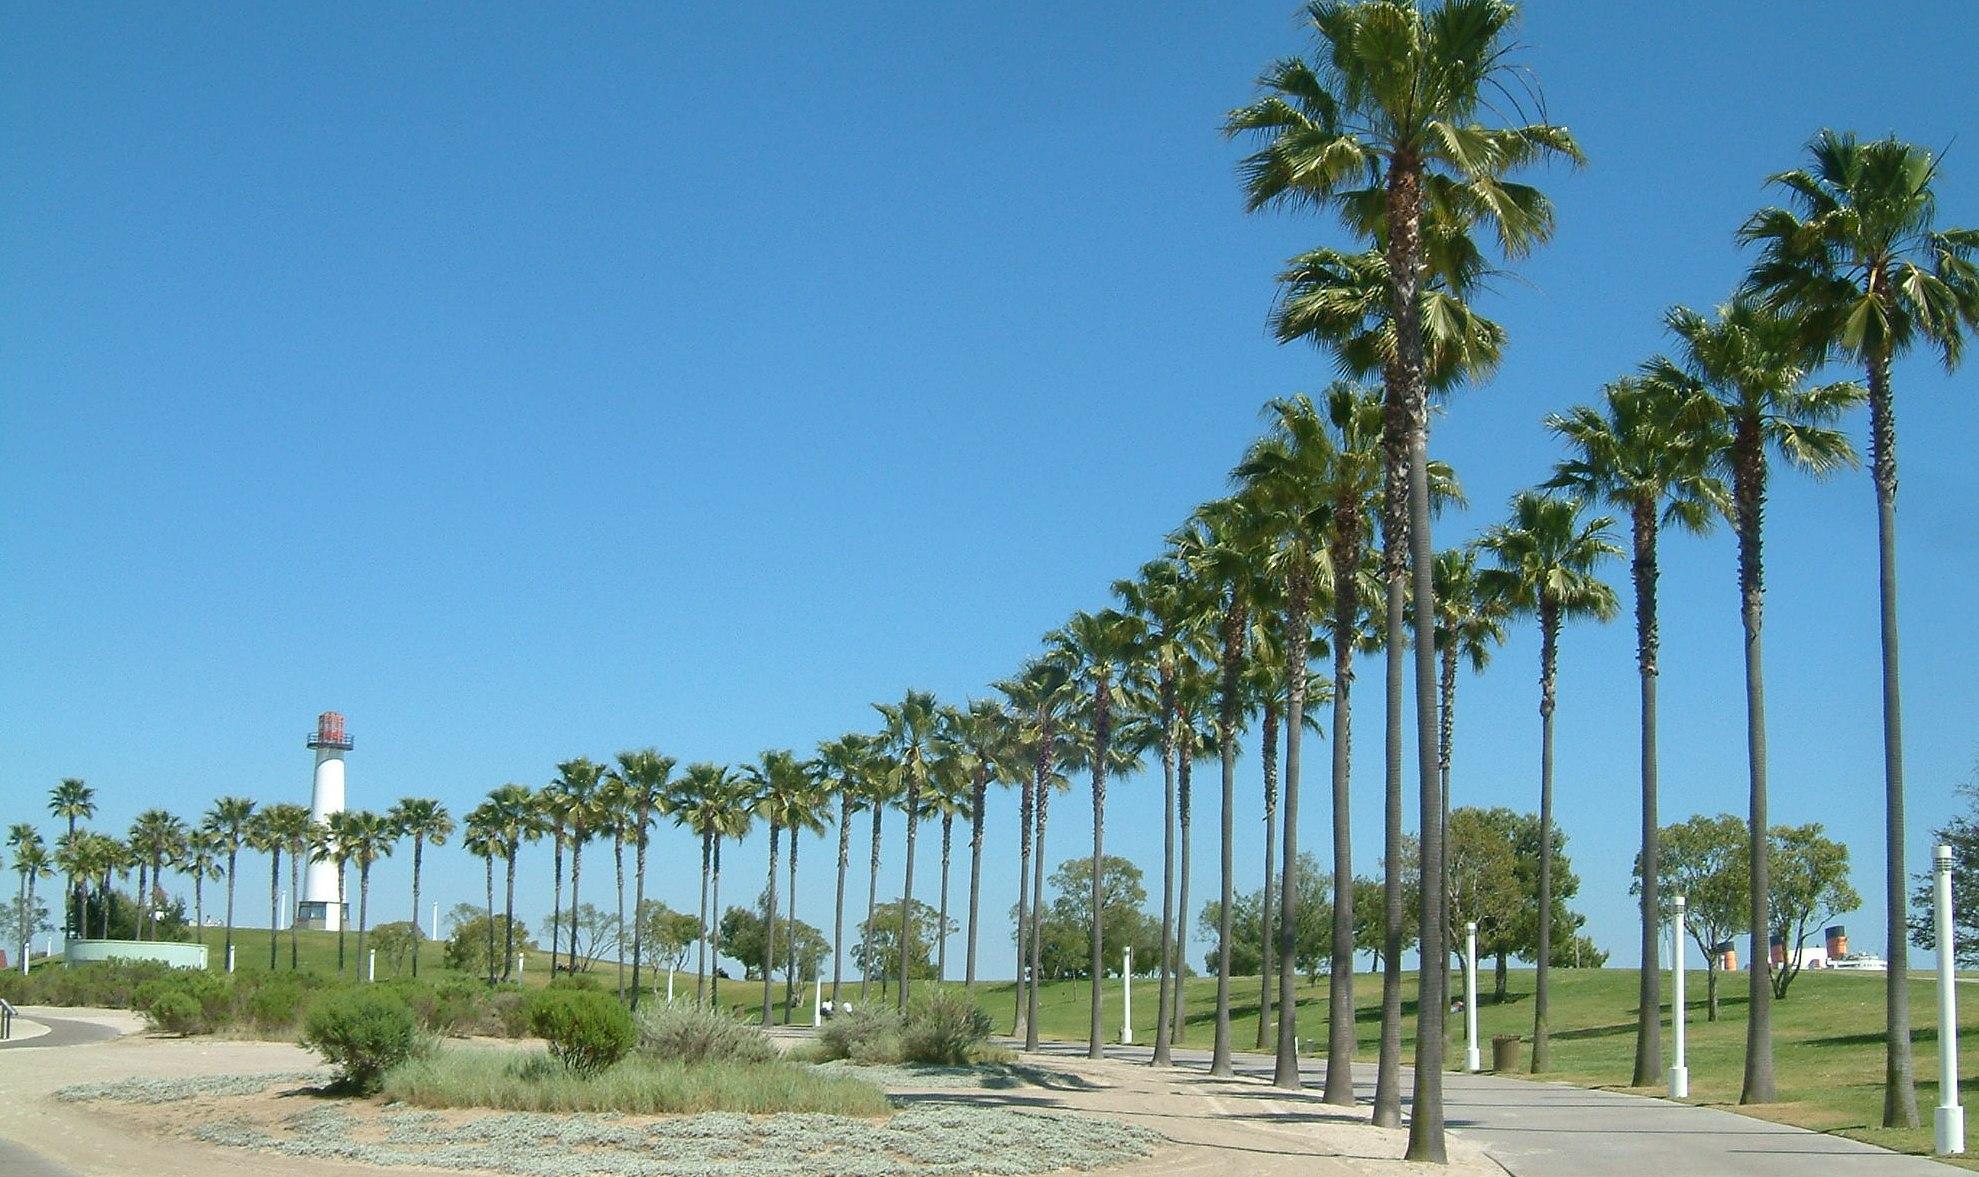 File:Long Beach 03.jpg.